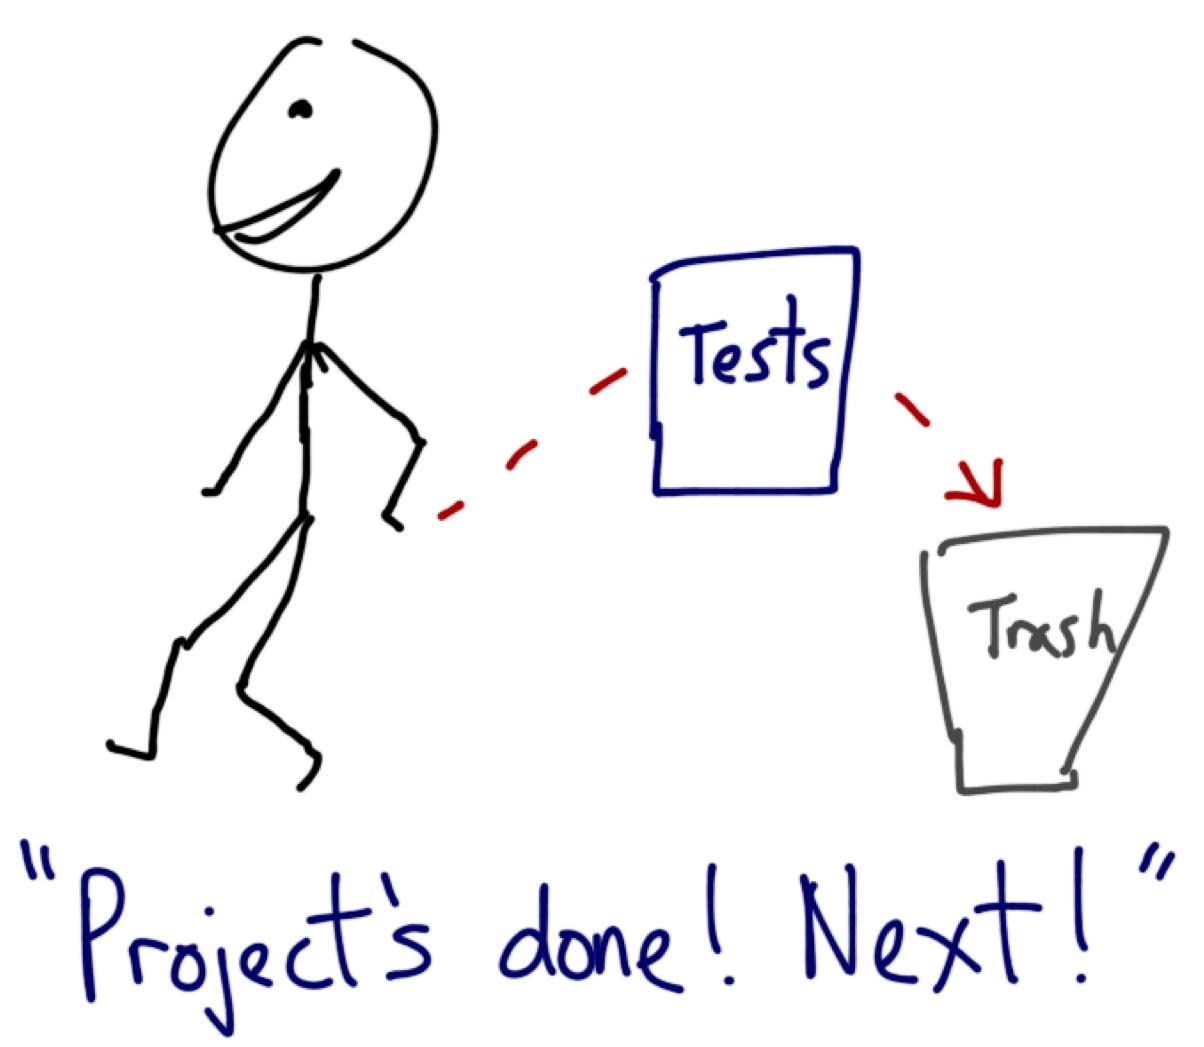 bp wellsite leader future programming [ 1204 x 1047 Pixel ]